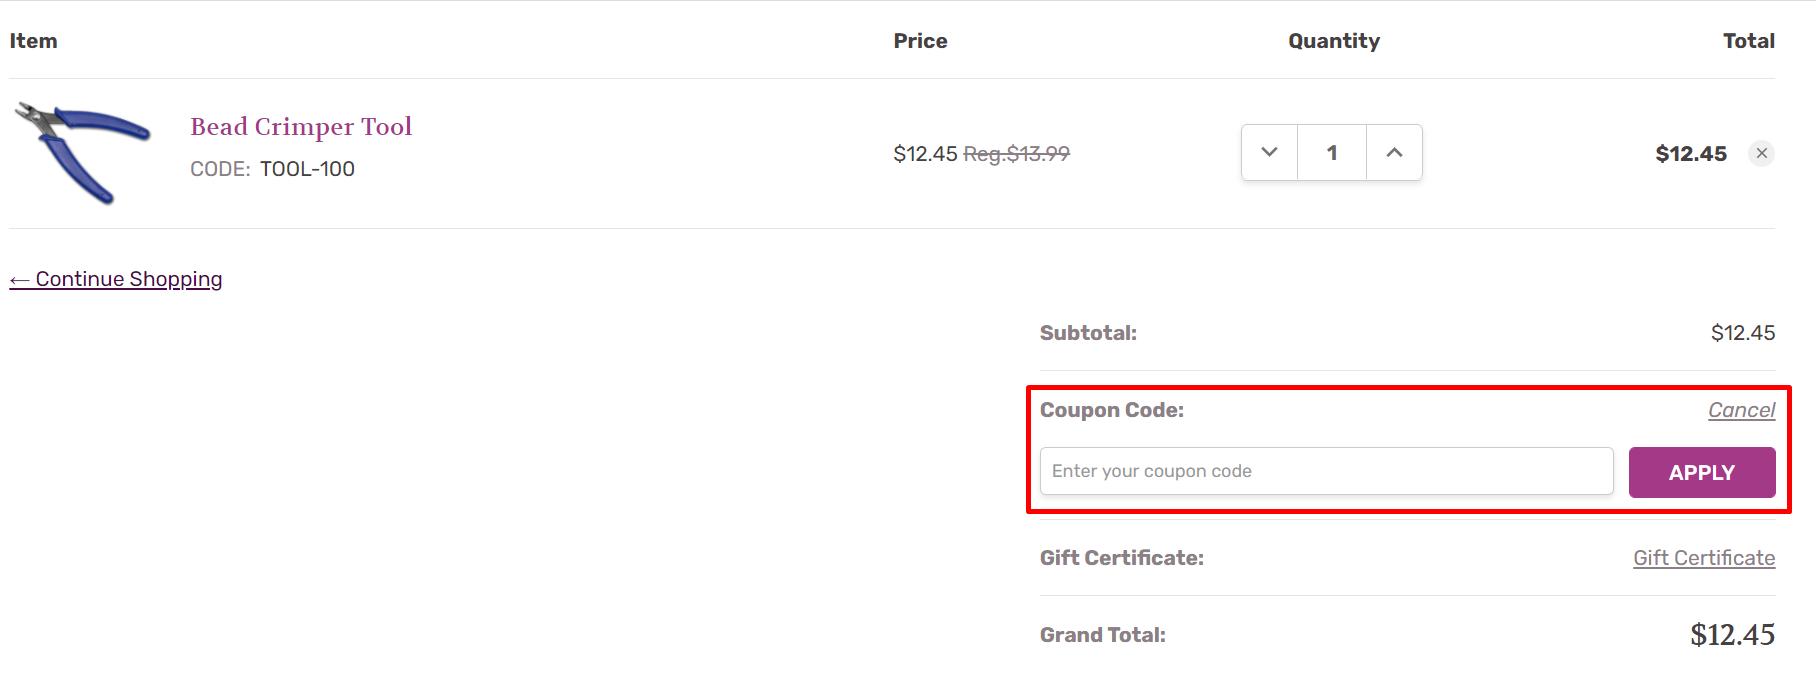 How do I use my Artbeads.com coupon code?